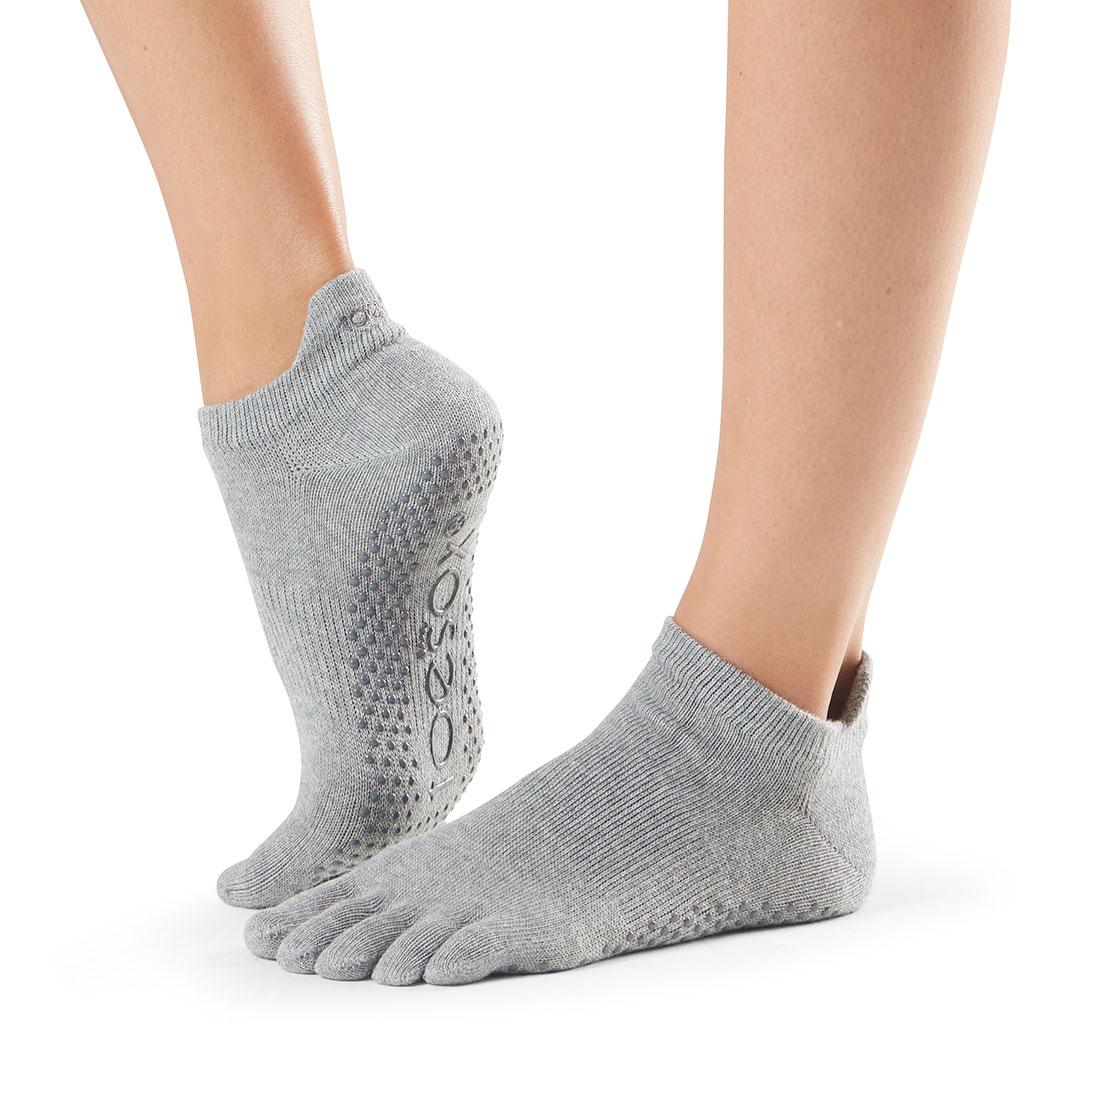 Yogasocken ToeSox Low Rise Full Toe Heather Grey - 1